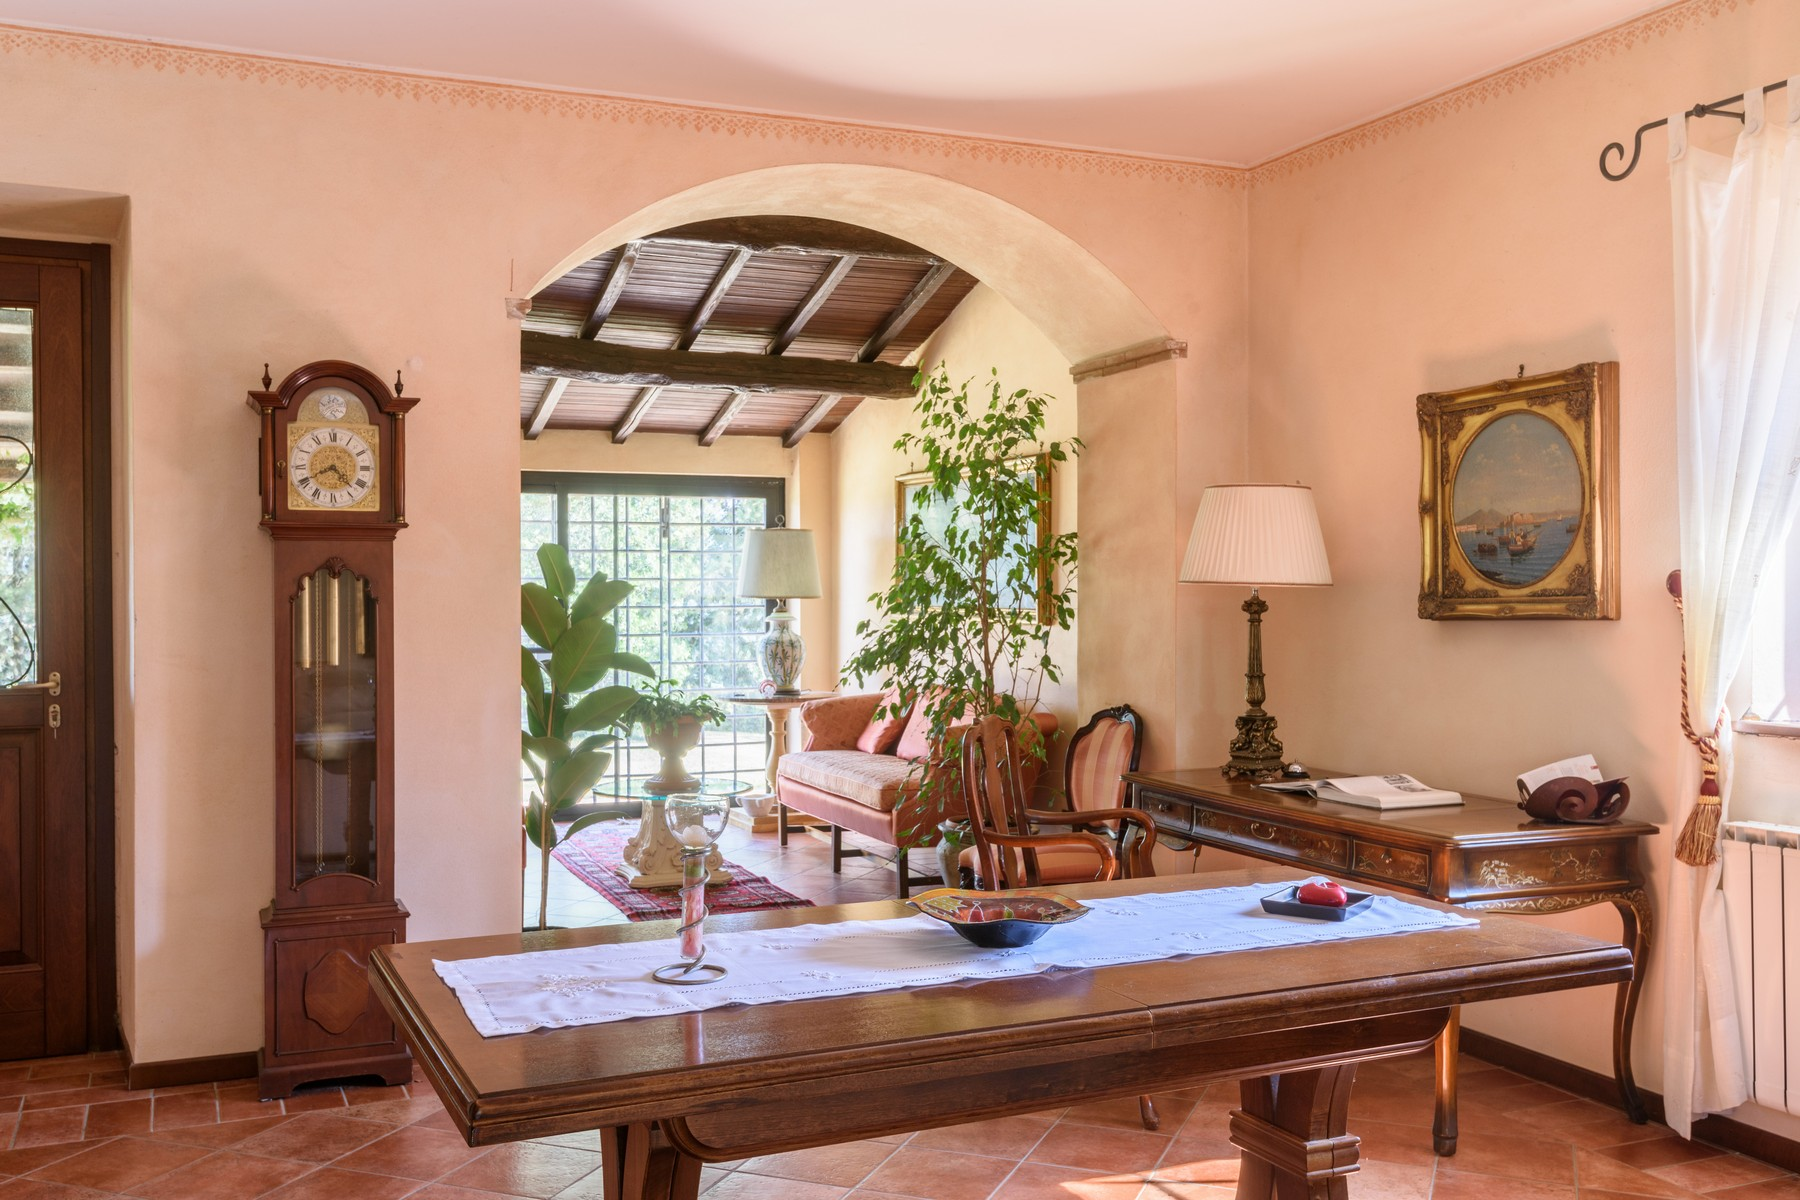 Casa indipendente in Vendita a Castel Viscardo: 5 locali, 700 mq - Foto 8